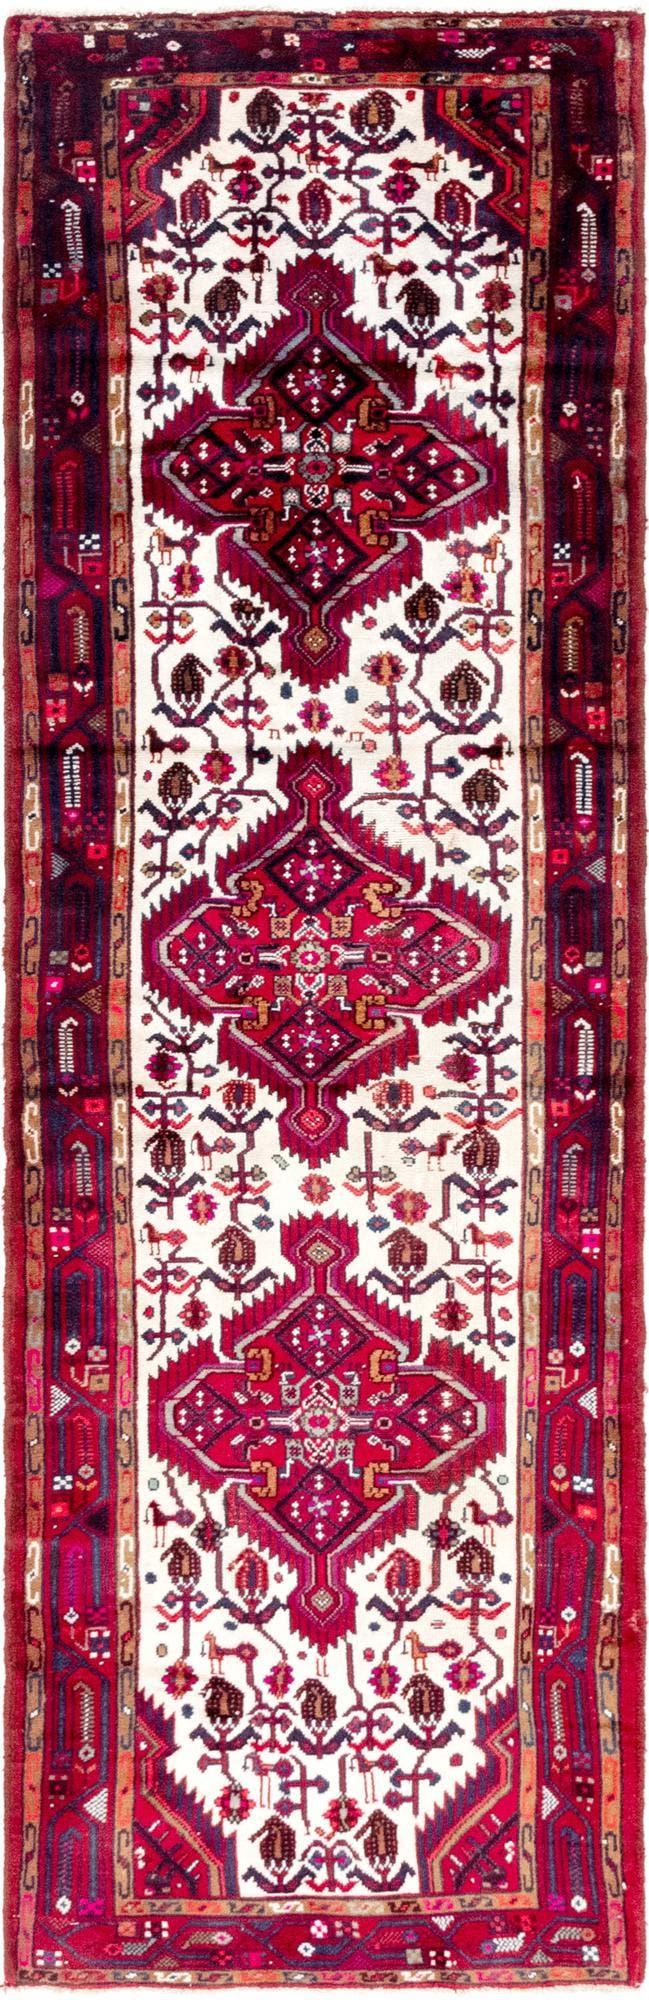 2' 10 x 9' 5 Darjazin Persian Runner Rug main image